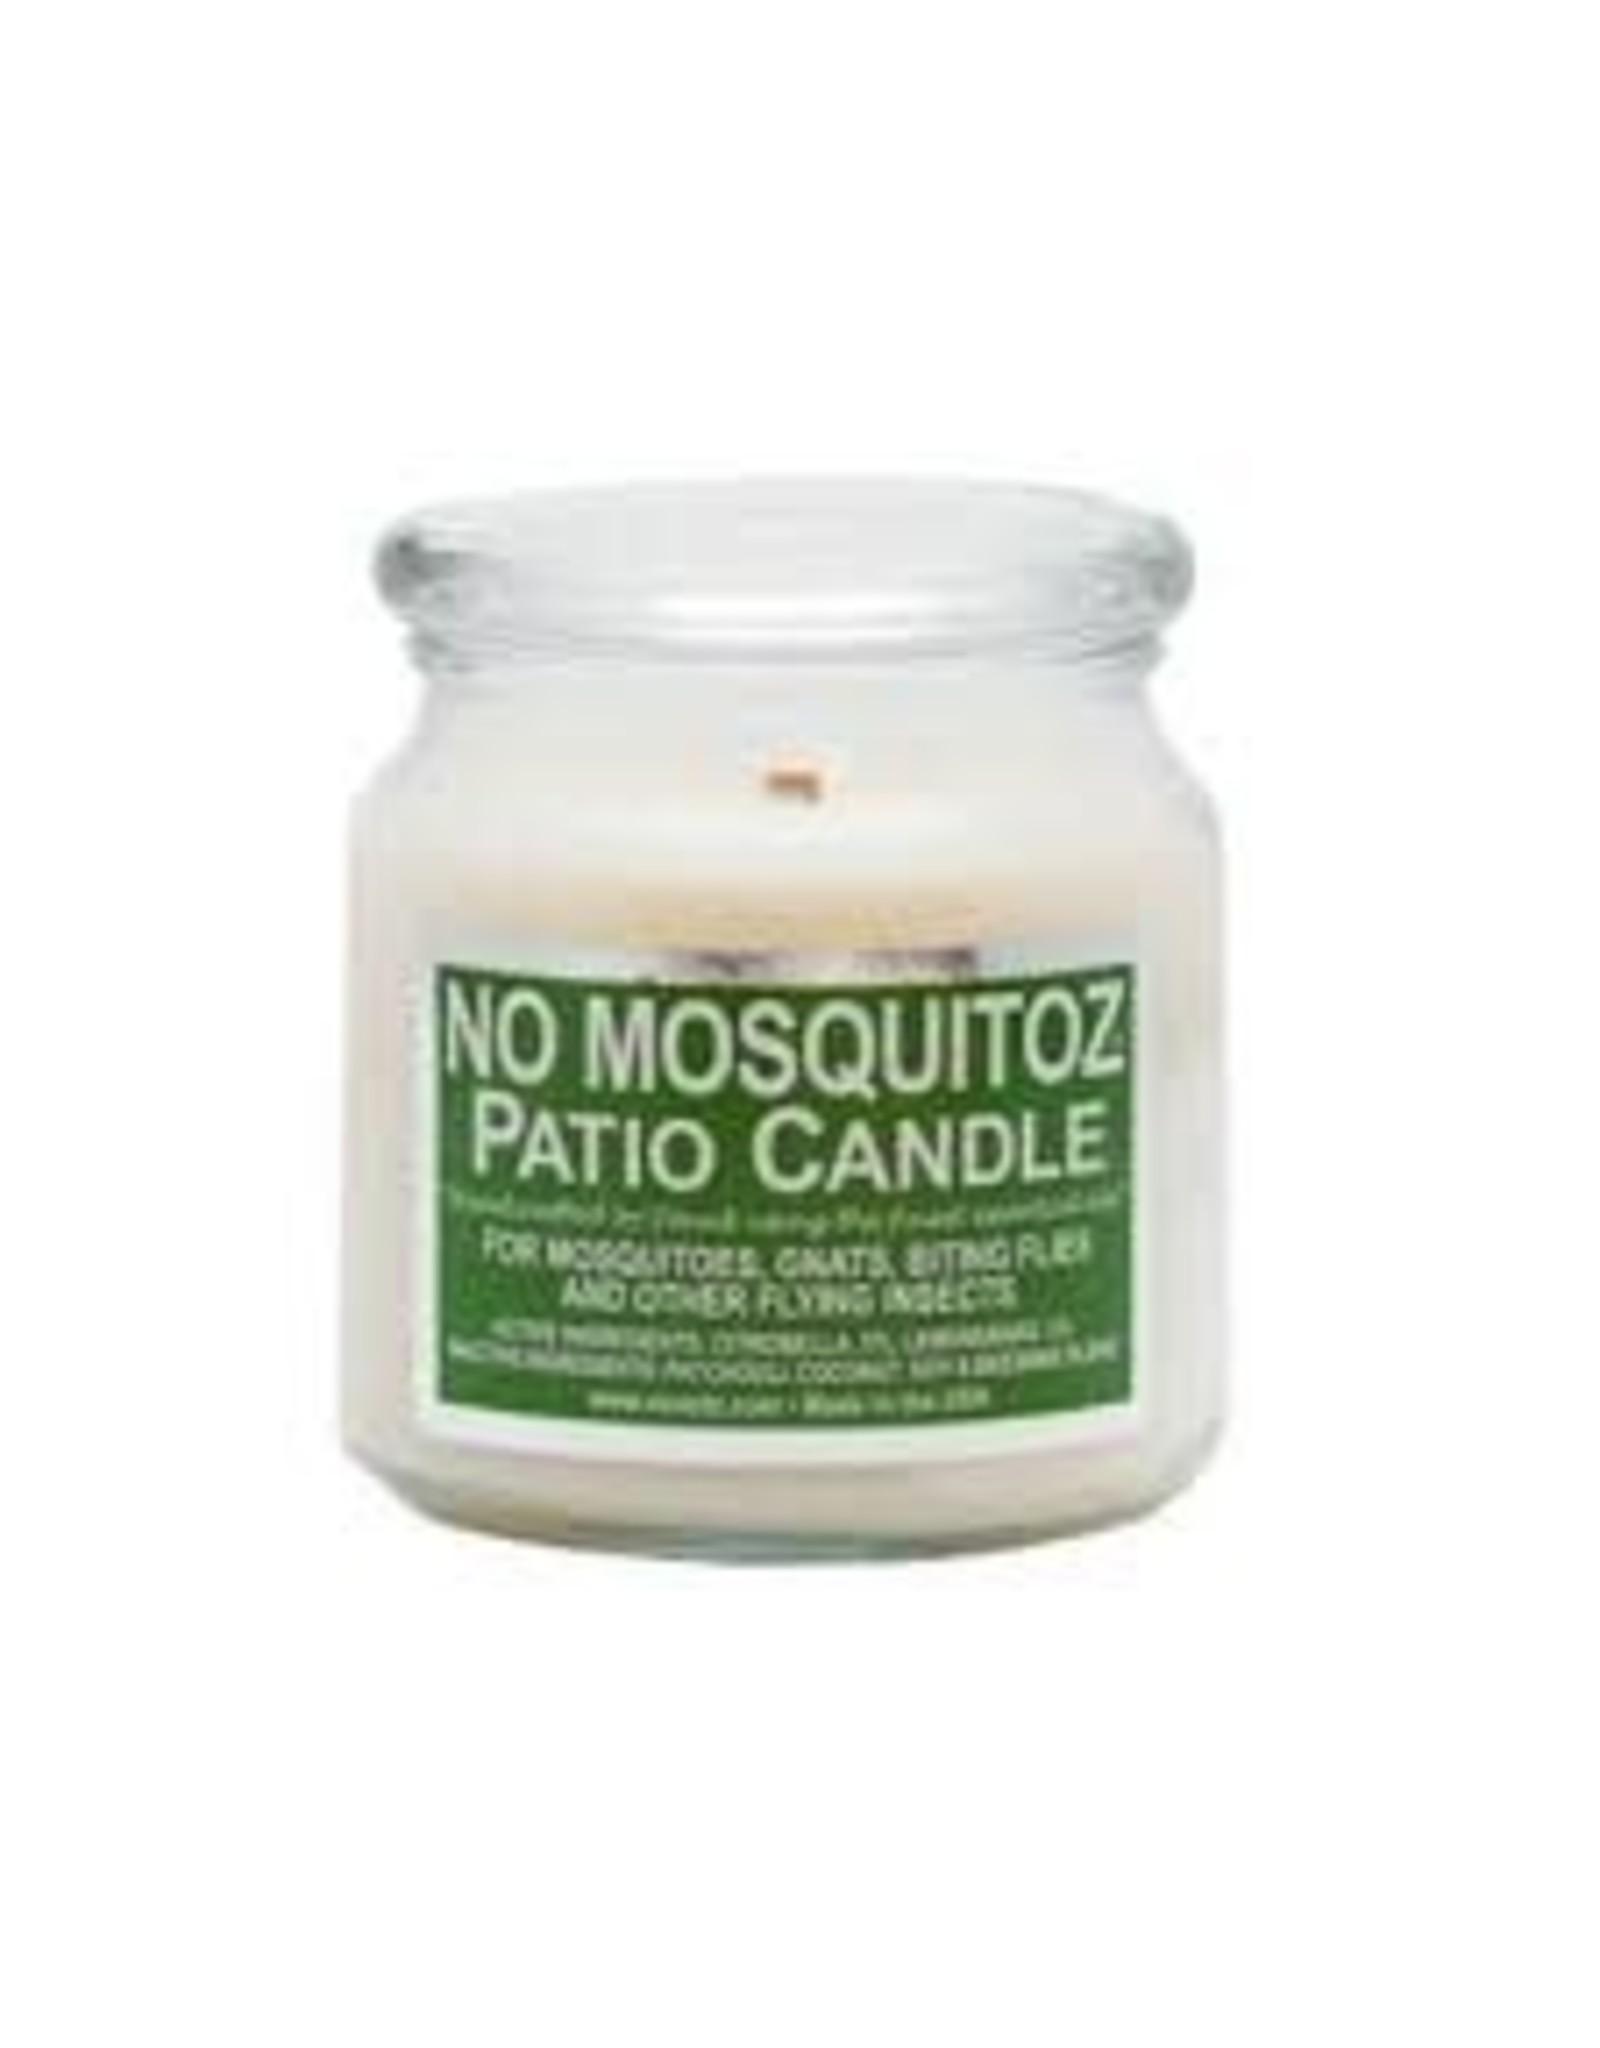 No Mosquitoz Candle 16oz